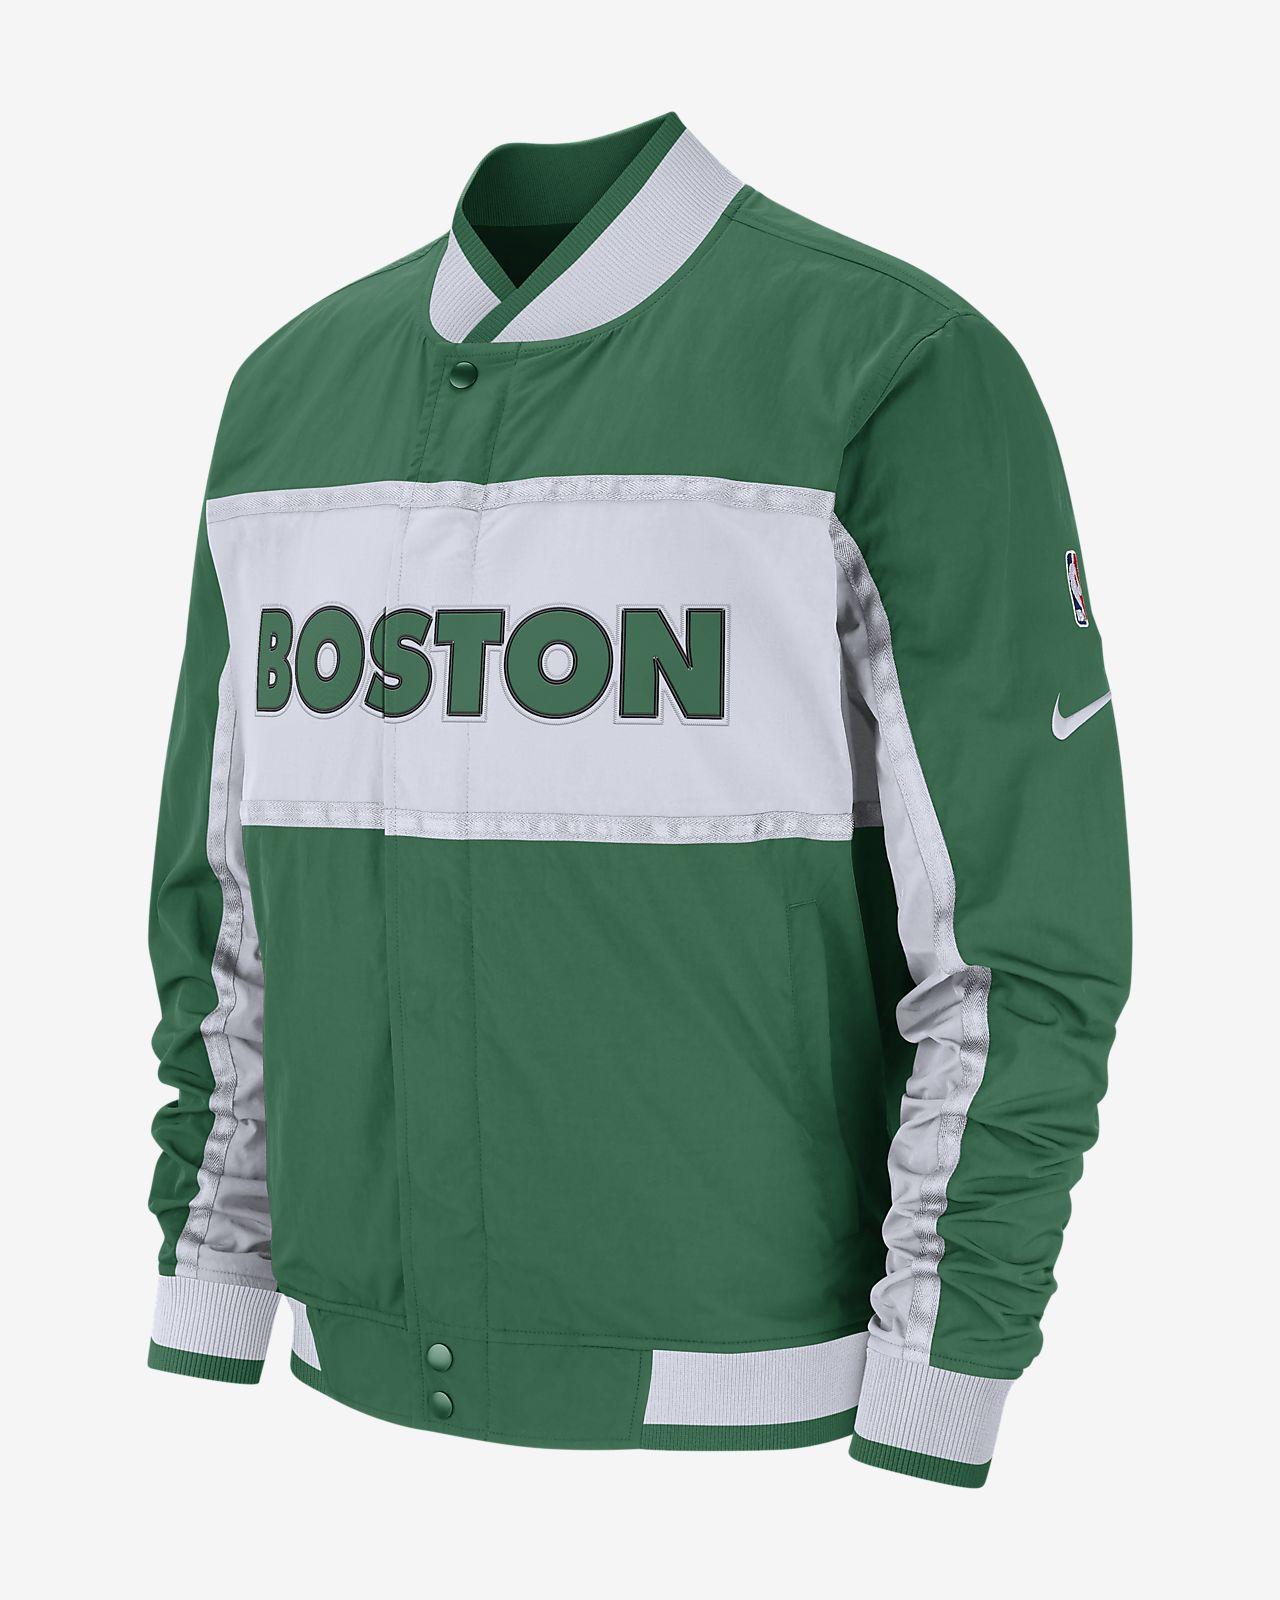 8a2d7a284 Boston Celtics Nike Courtside Men s NBA Jacket. Nike.com BE